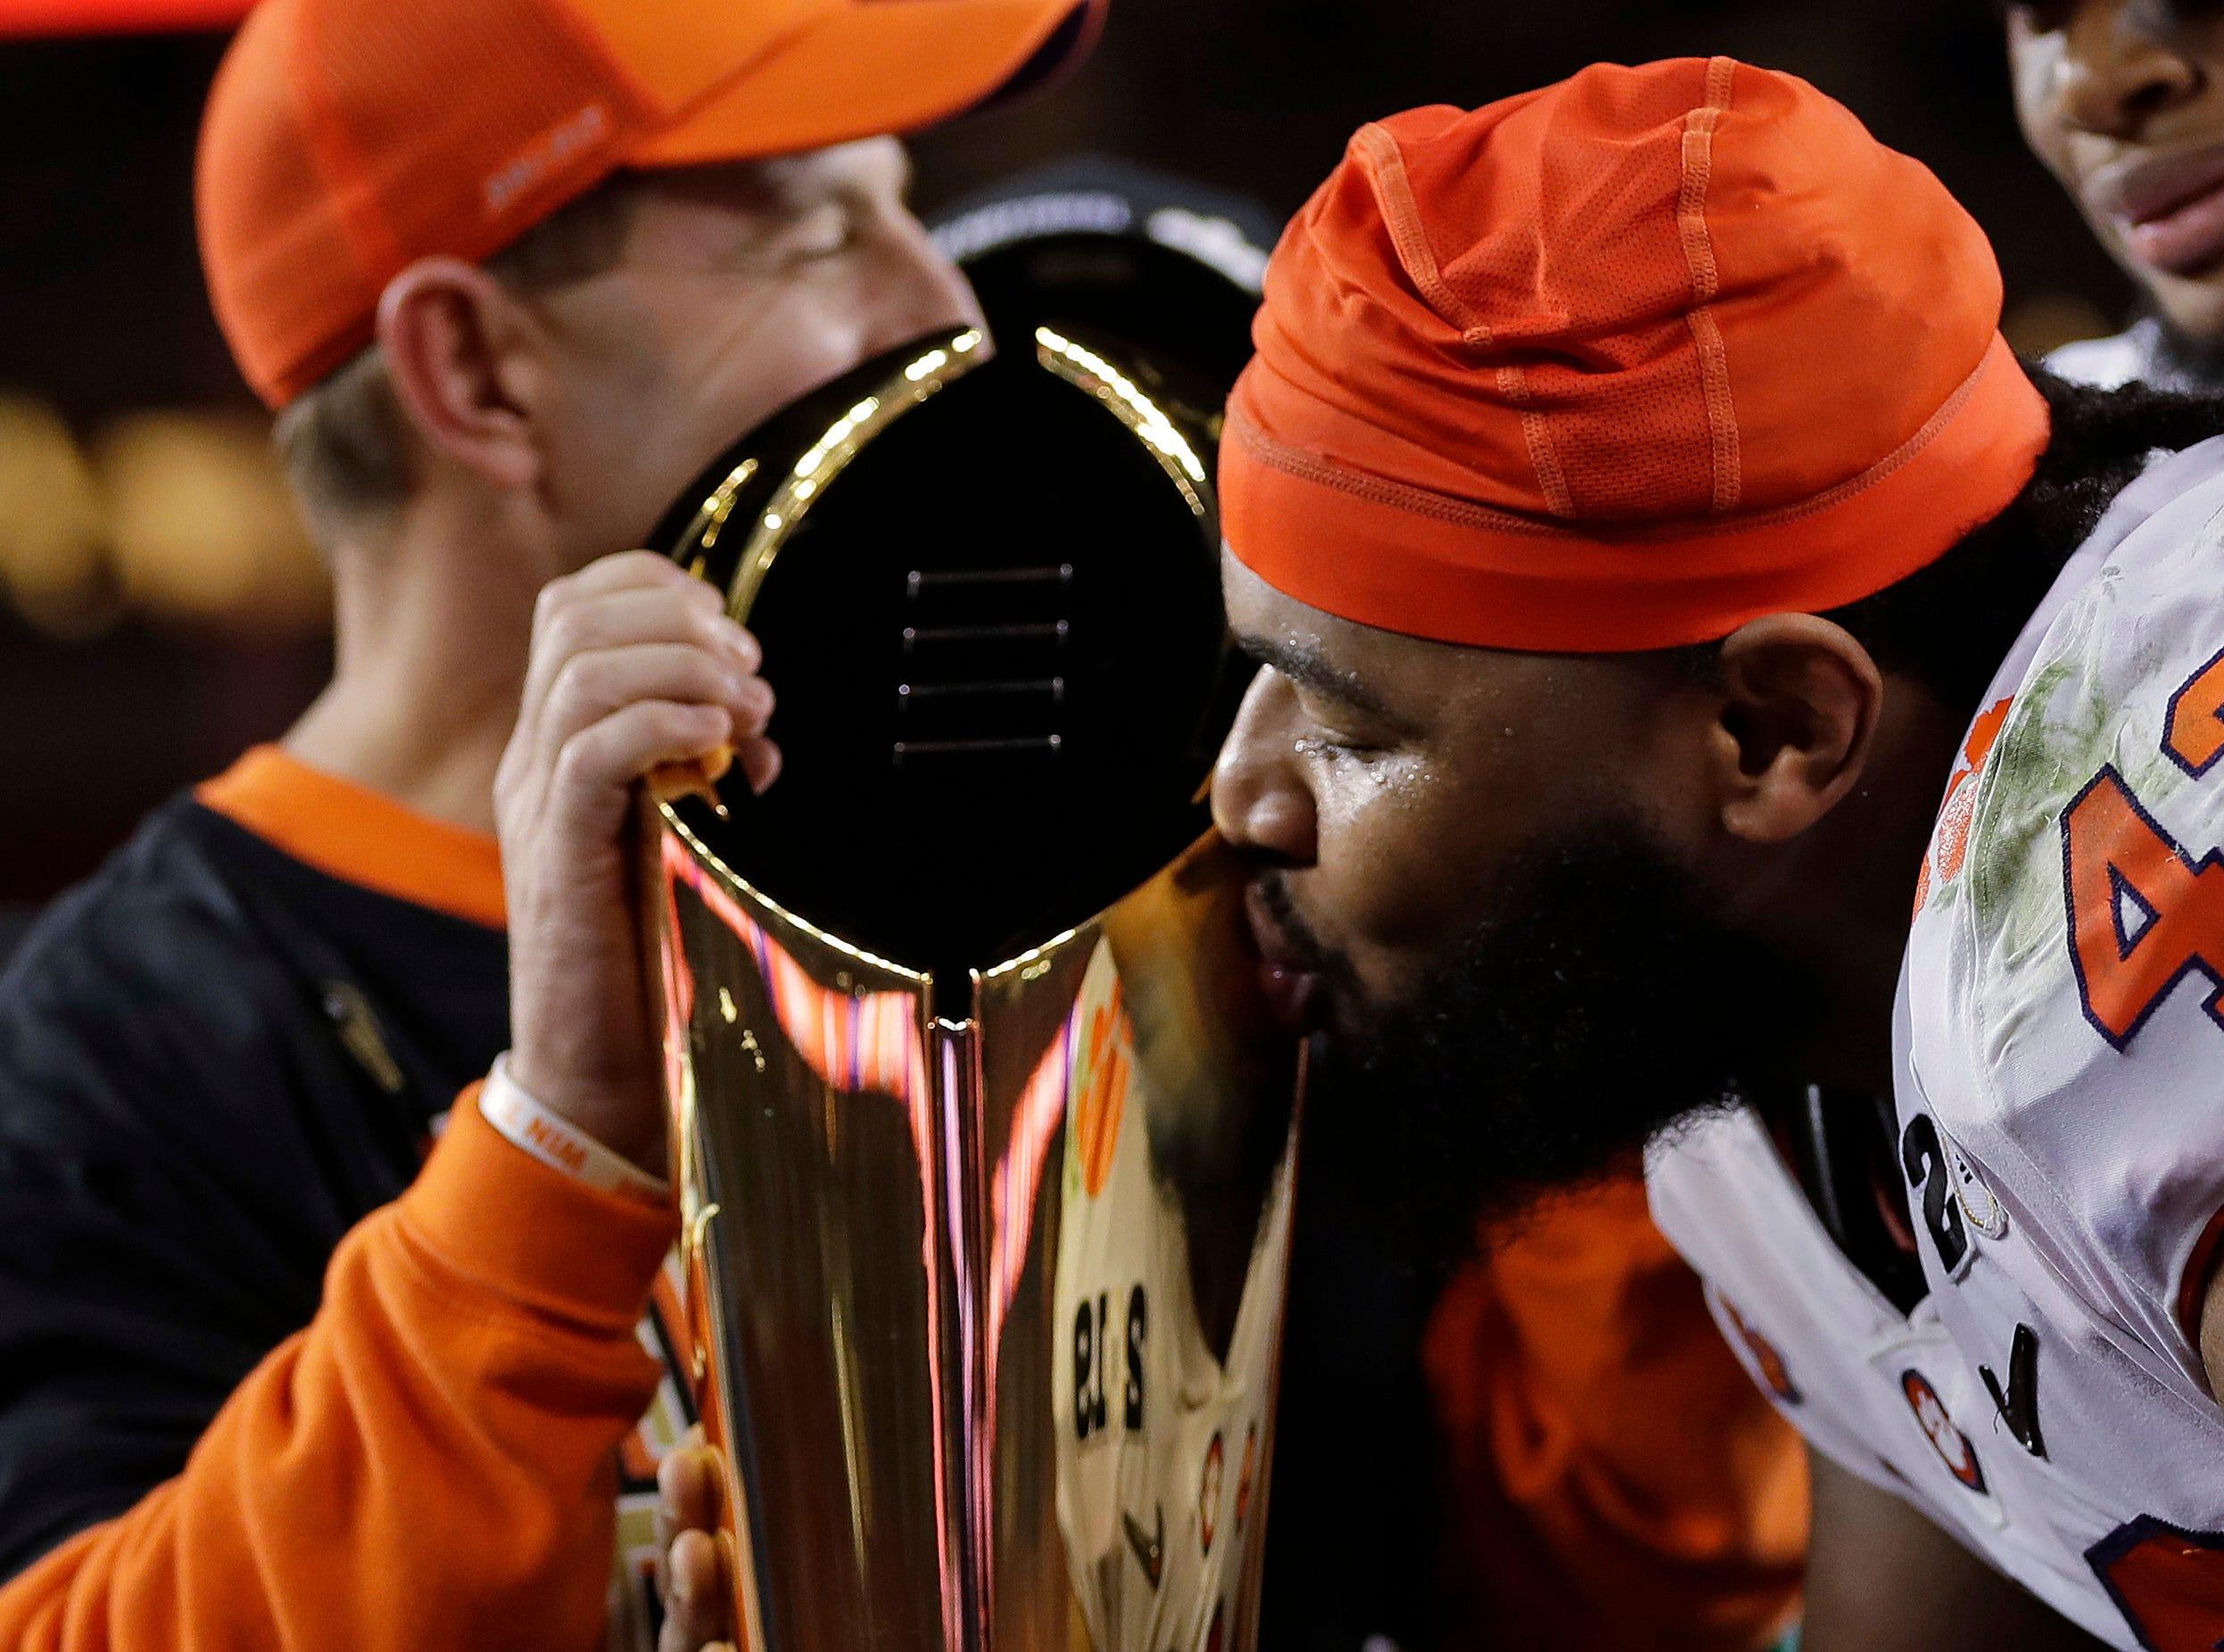 Clemson's Christian Wilkins kisses the trophy after the NCAA college football playoff championship game against Alabama, Monday, Jan. 7, 2019, in Santa Clara, Calif. Clemson beat Alabama 44-16. (AP Photo/David J. Phillip)